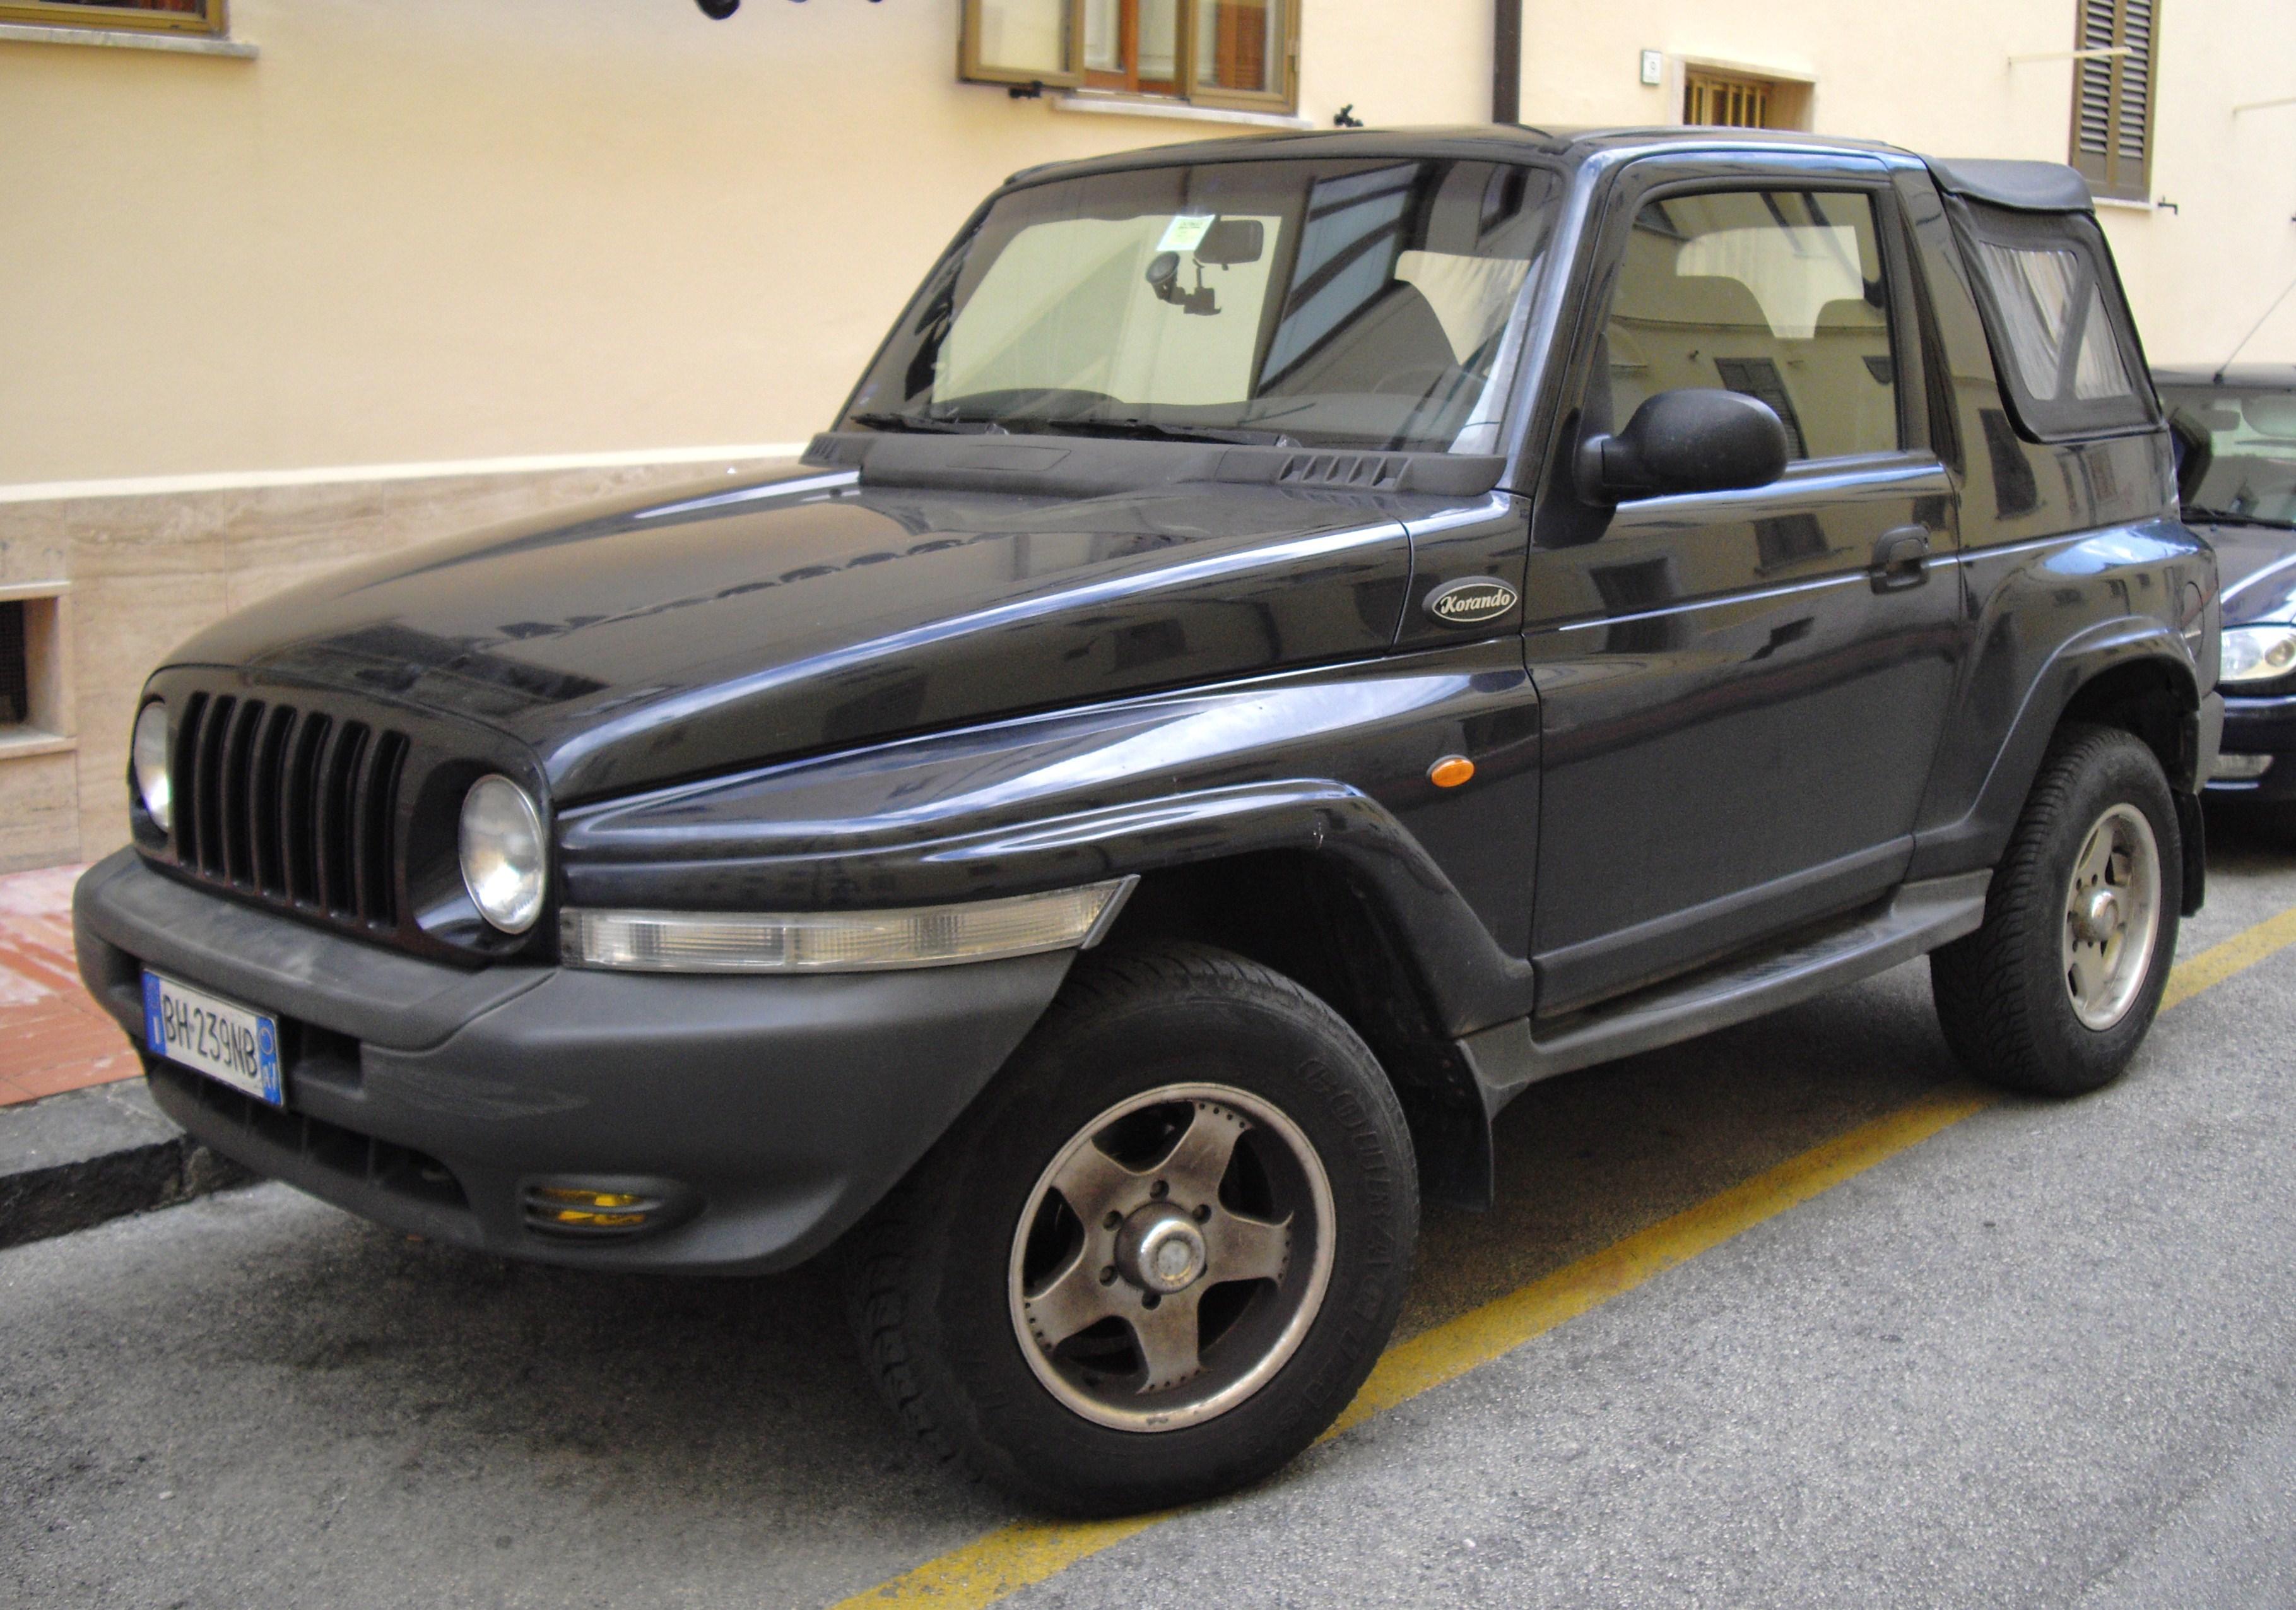 Fiche technique Daewoo Korando de 2000 à 2004